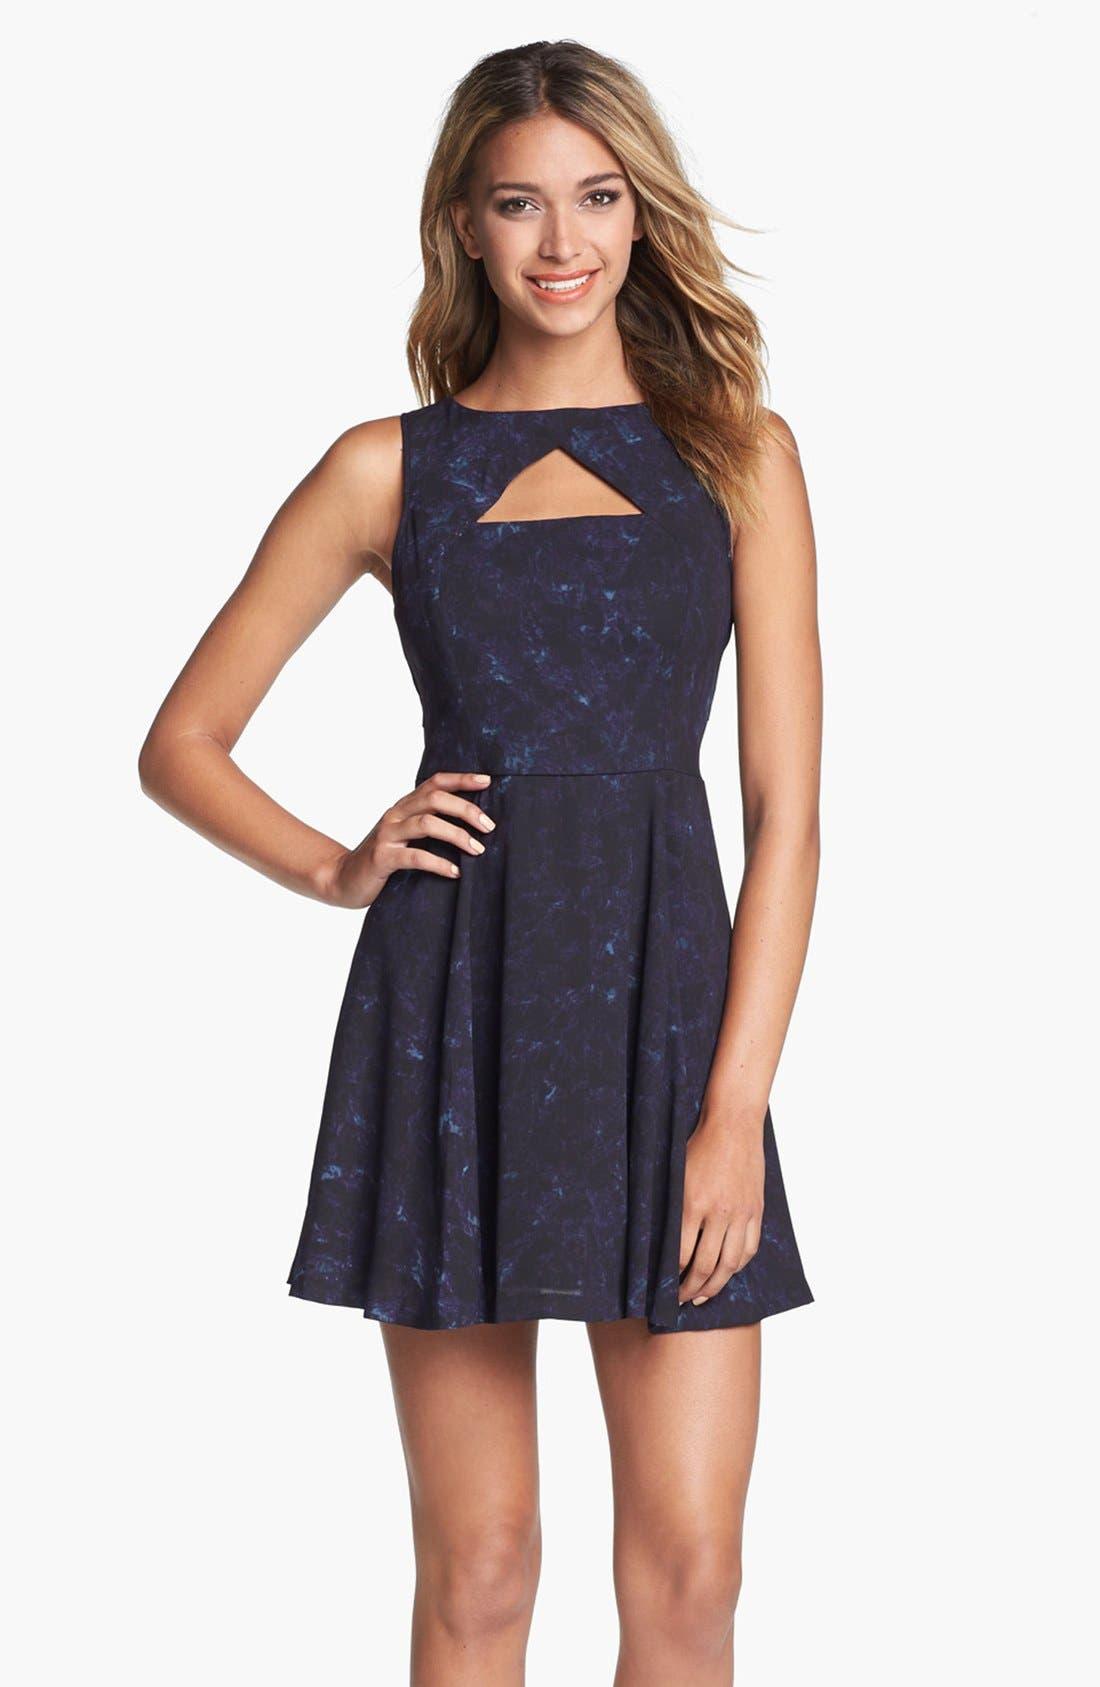 Alternate Image 1 Selected - BB Dakota 'Della' Print Fit & Flare Dress